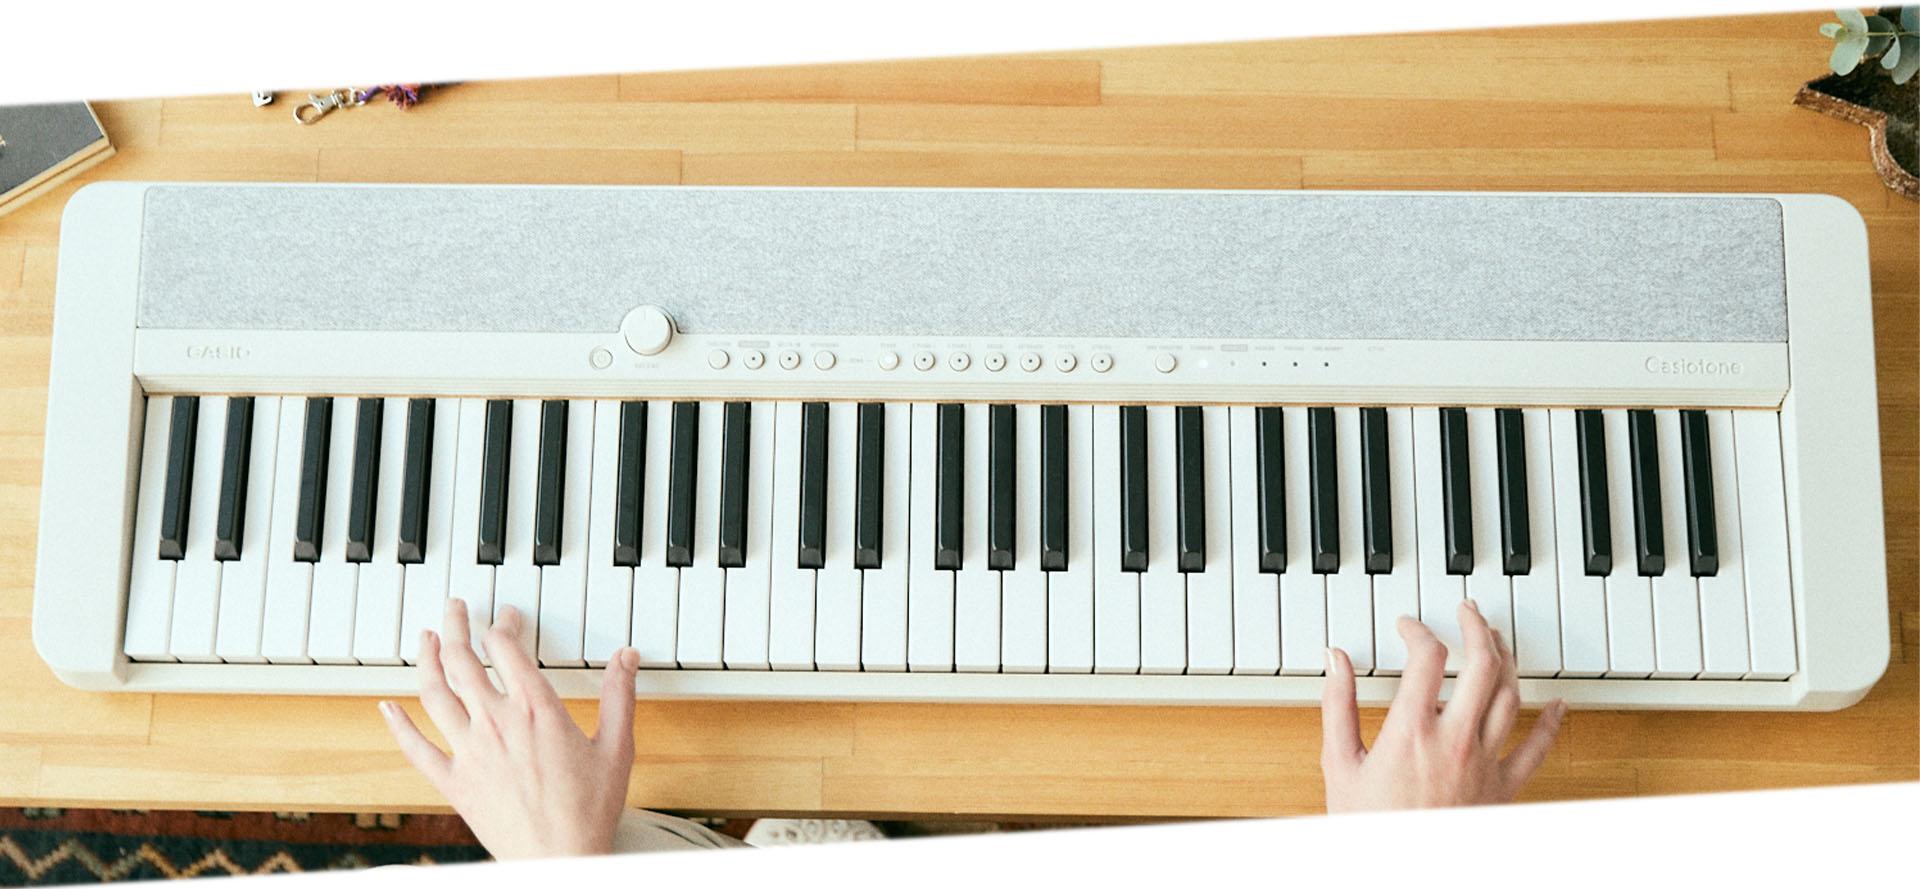 Teclado / piano digital Casio Casiotone CT-S1